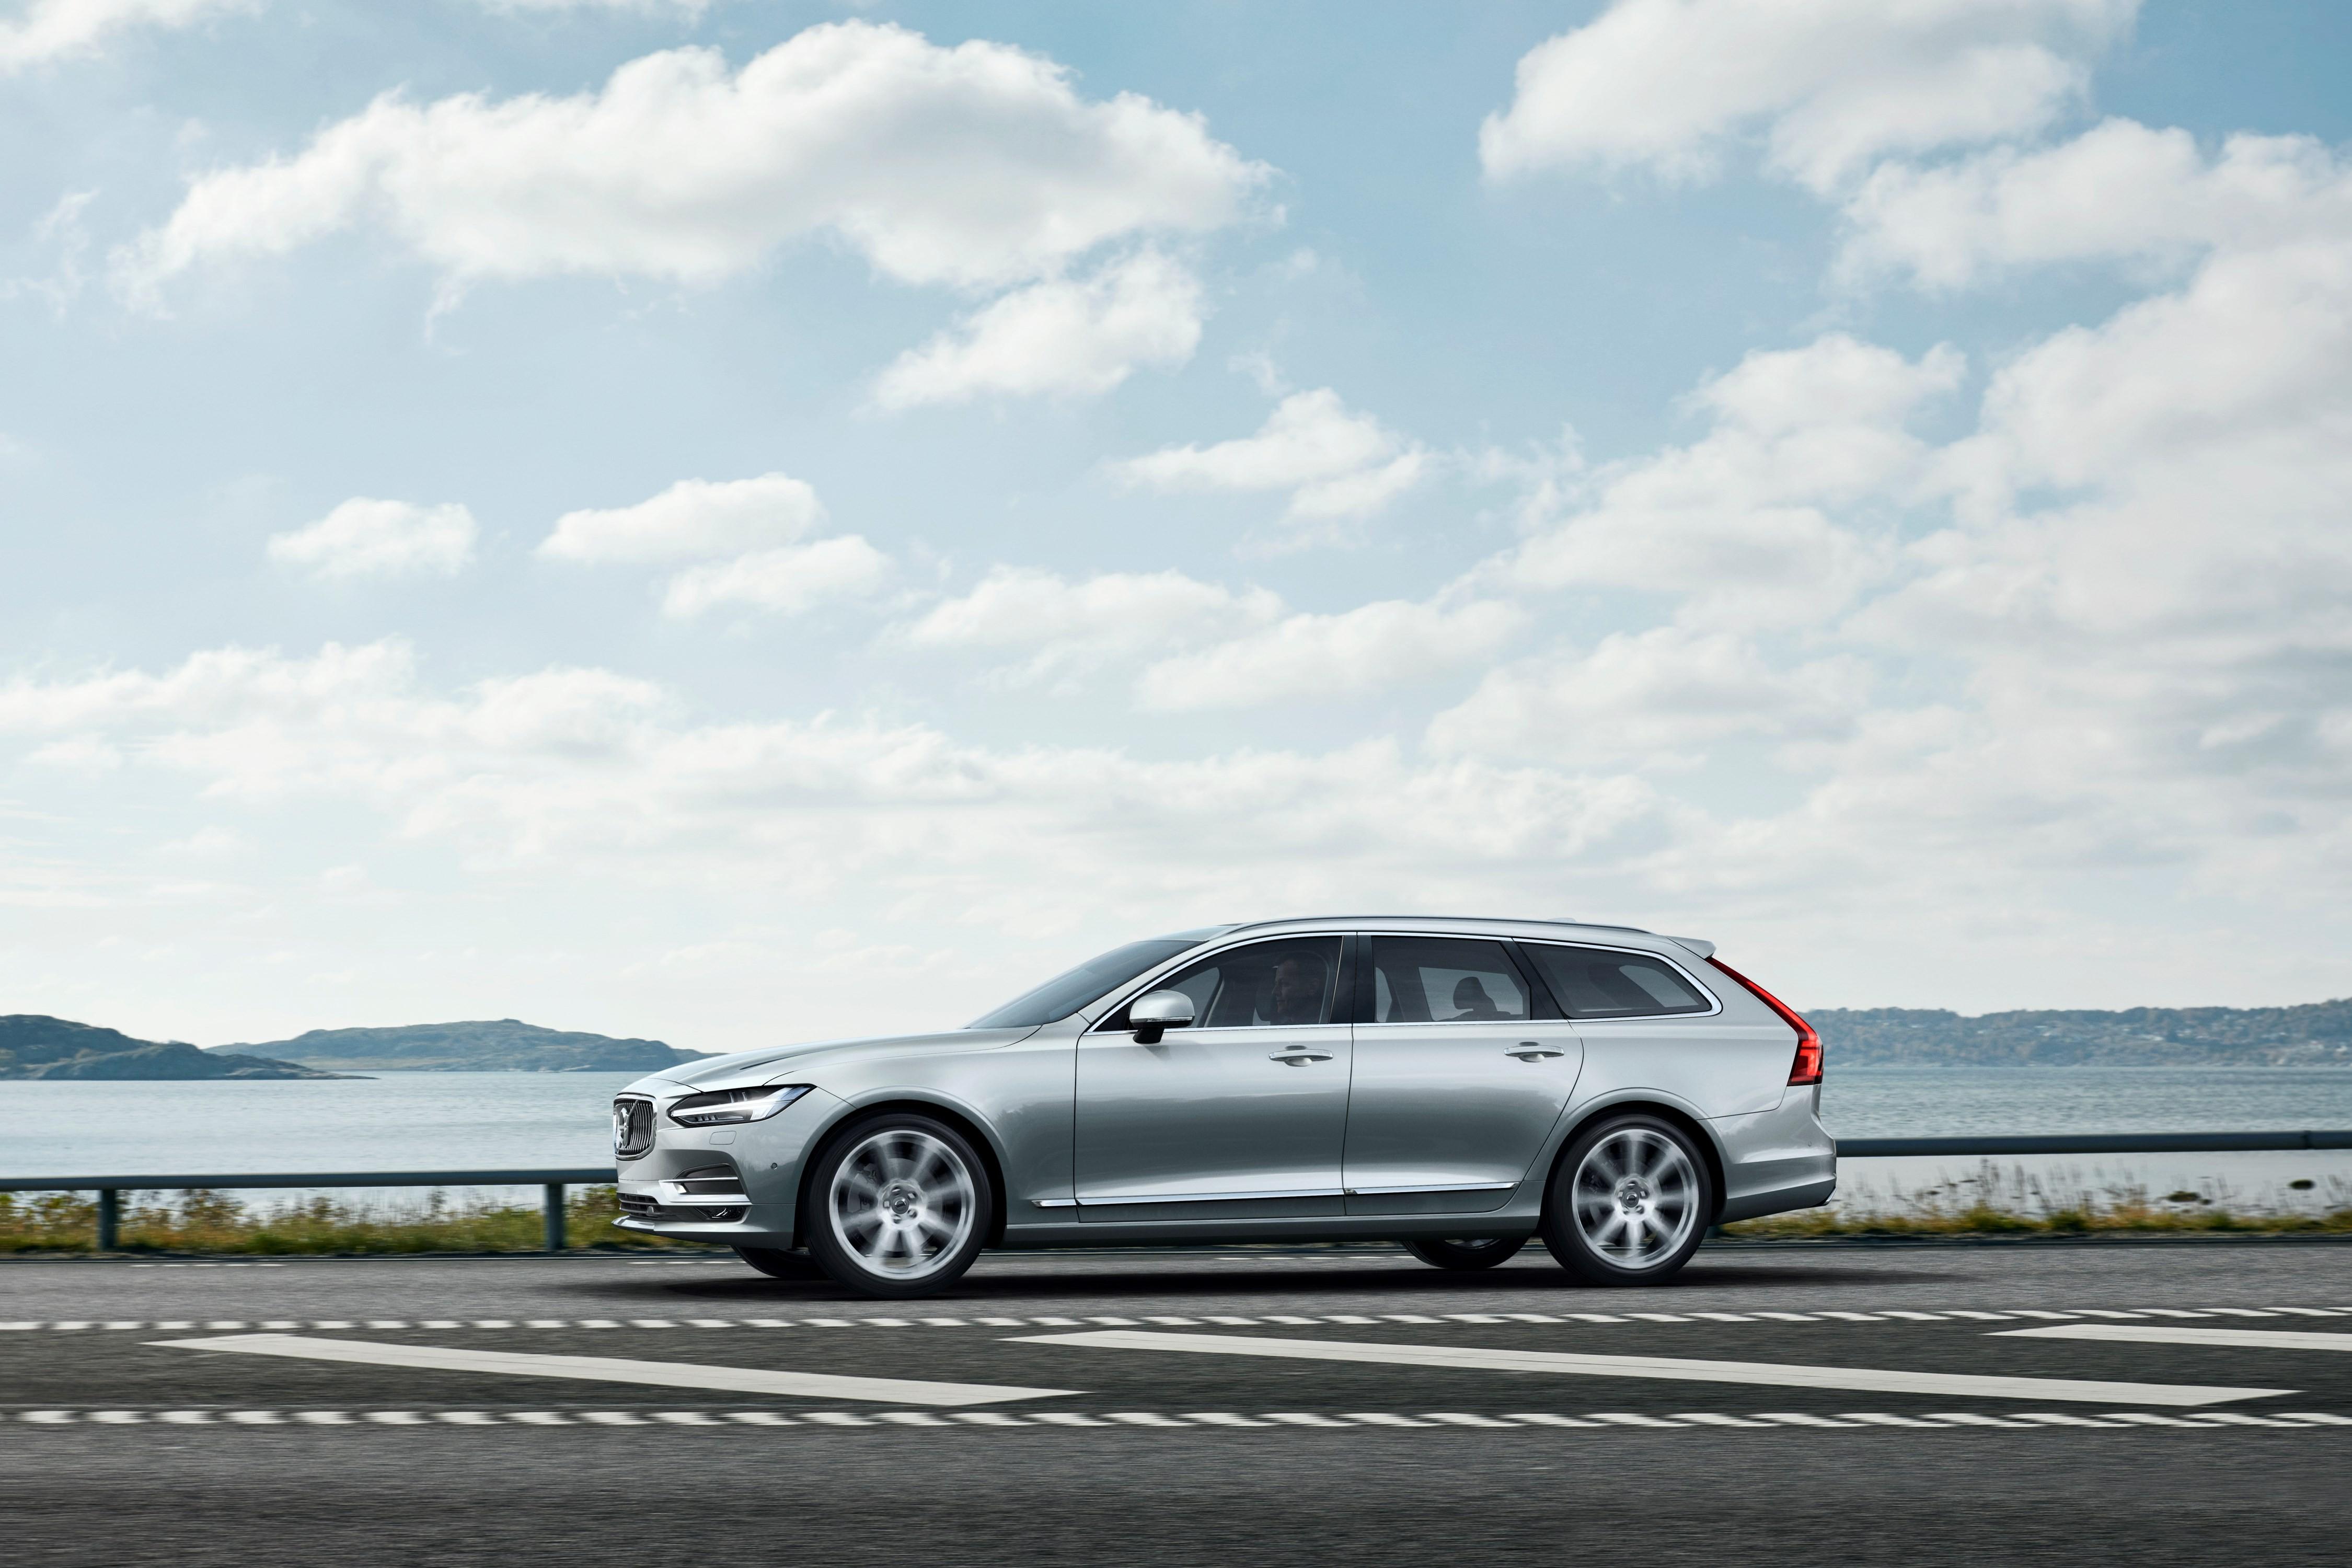 2016 volvo v90 wagon officially revealed in sweden